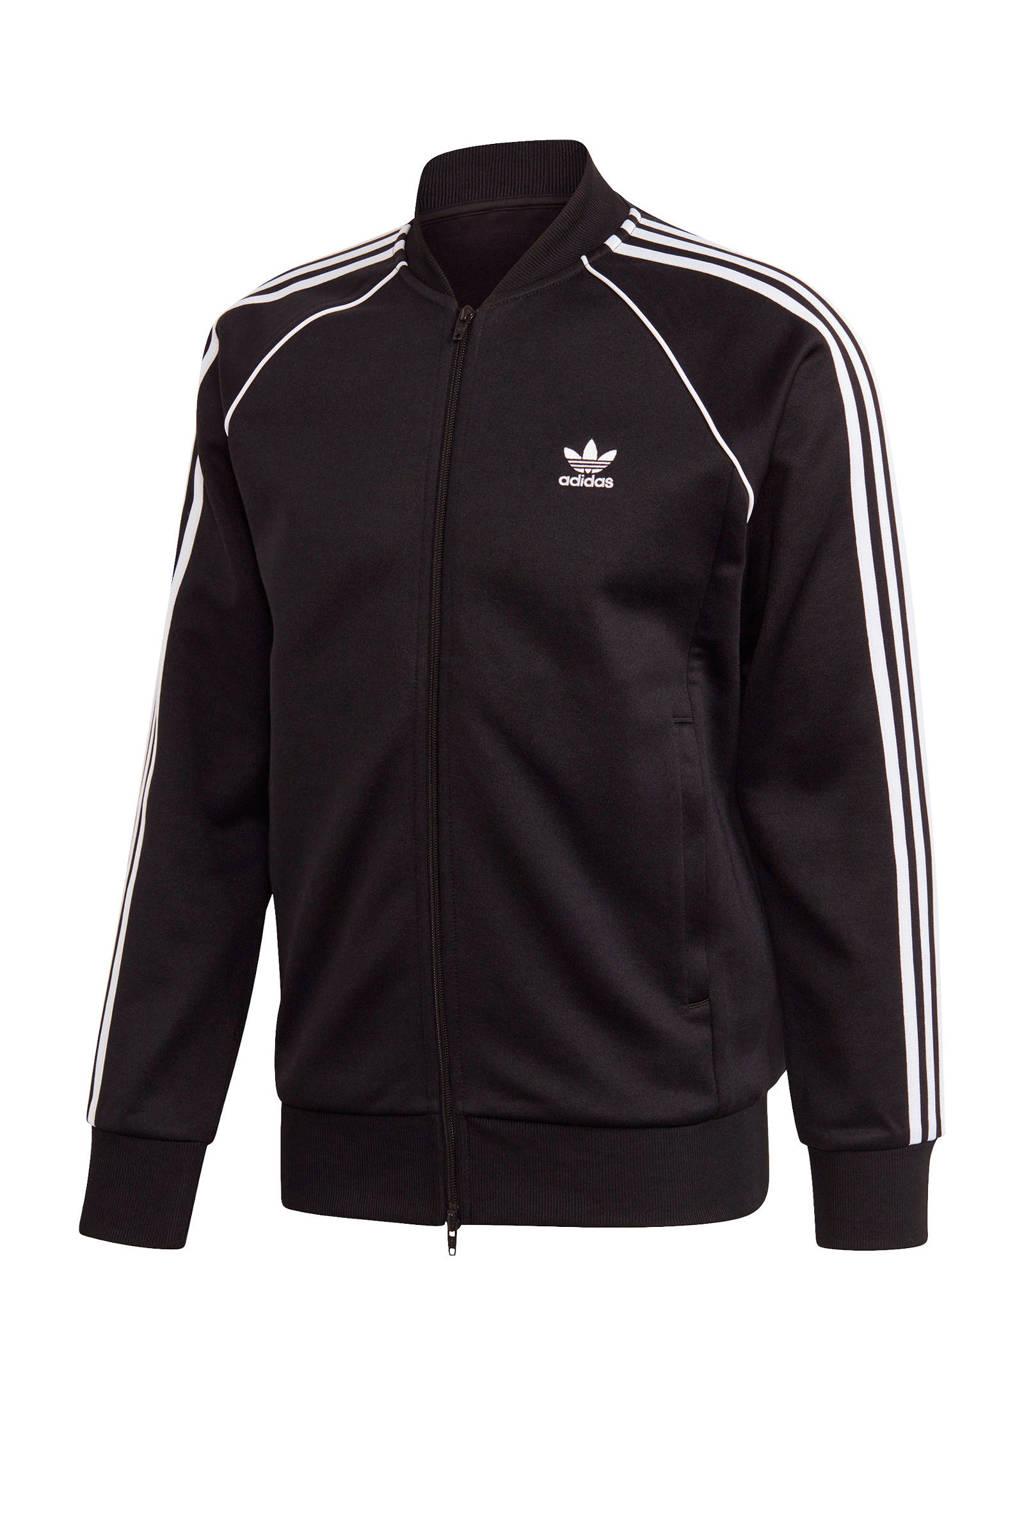 adidas Originals vest zwart, Zwart